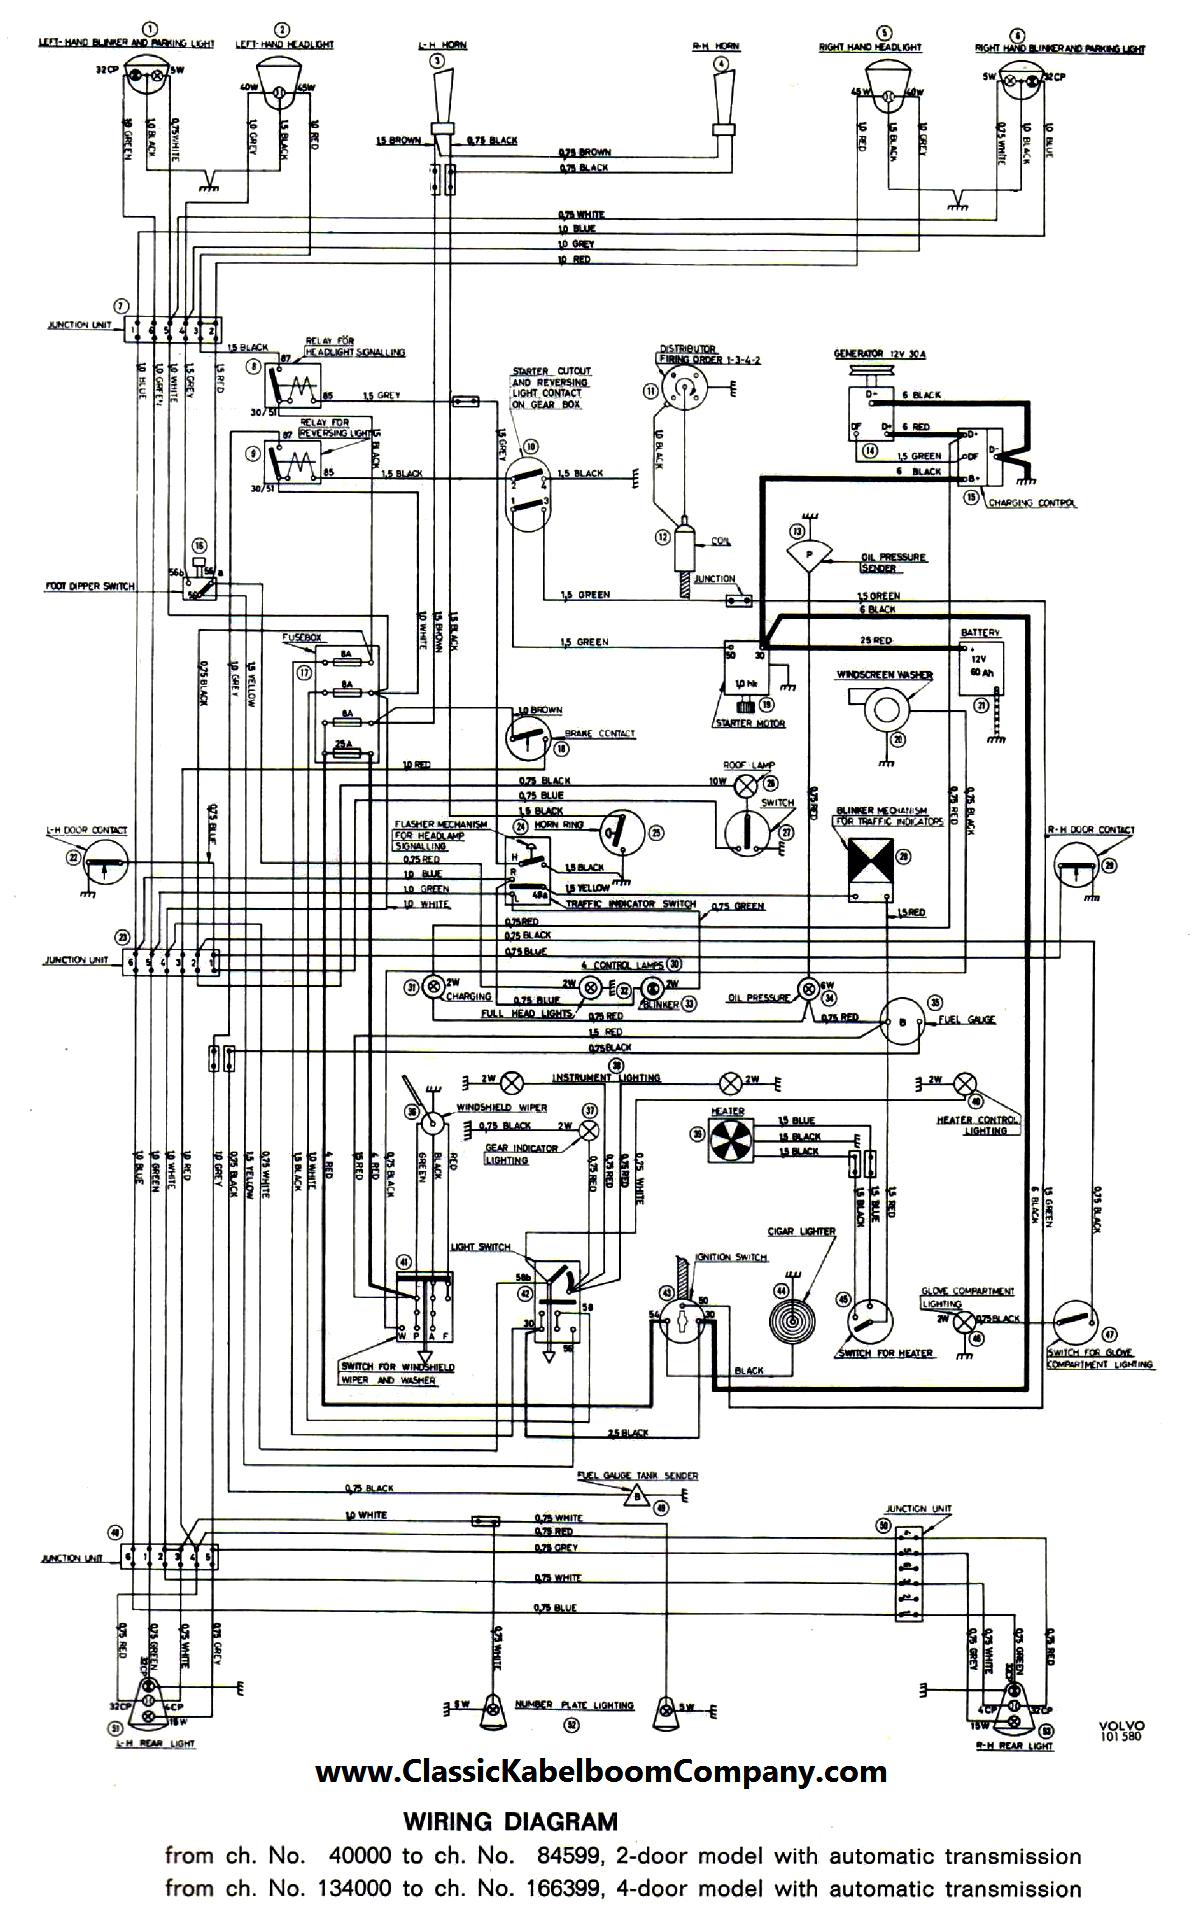 magnificent volvo penta starter wiring diagram illustration rh piotomar info 1996 Volvo Penta Starter Wiring Diagram 1996 Volvo Penta Starter Wiring Diagram